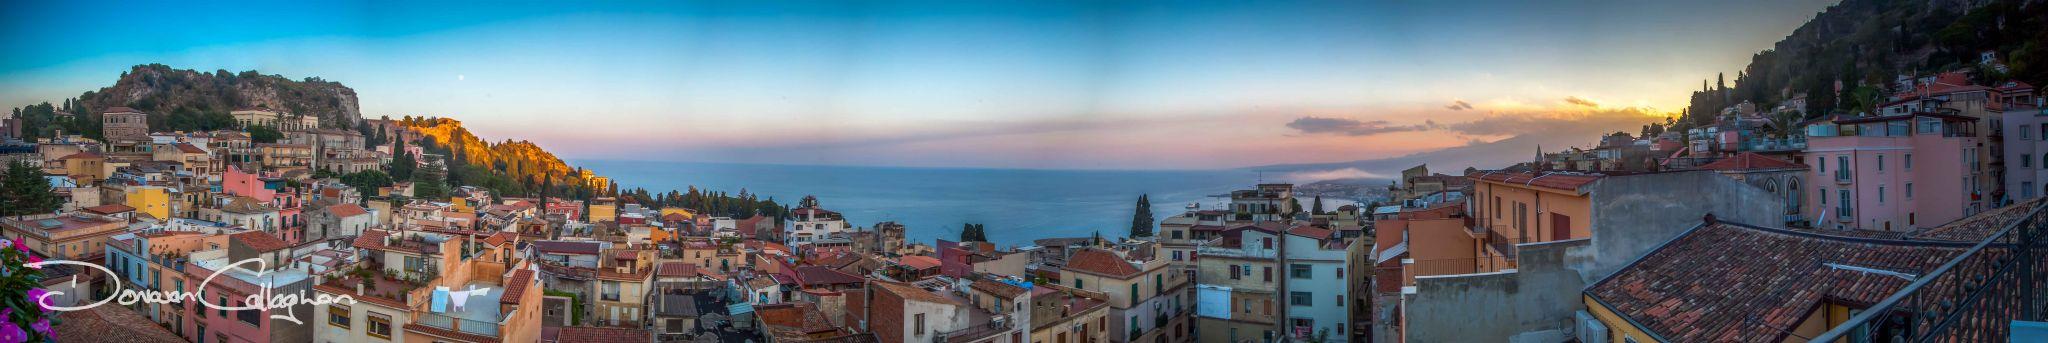 Panorama of city scape Taormina, Italy